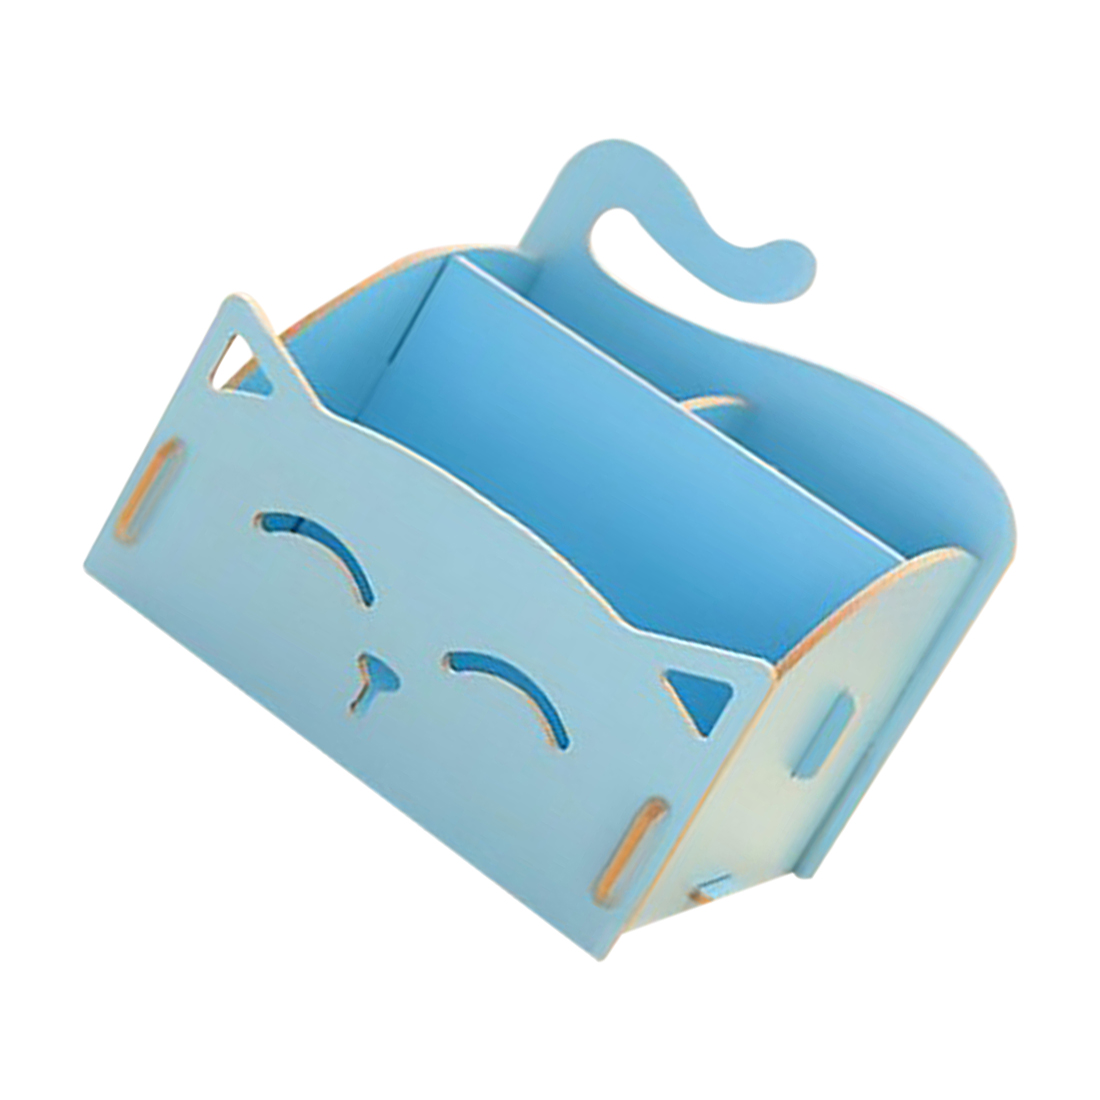 Best Wooden Box Cute Cat Pen Box Desktop Storage Assembly DIY Wood Makeup Organizer Cosmetics Storage Box 15.4*13*13.5cm (BLUE)